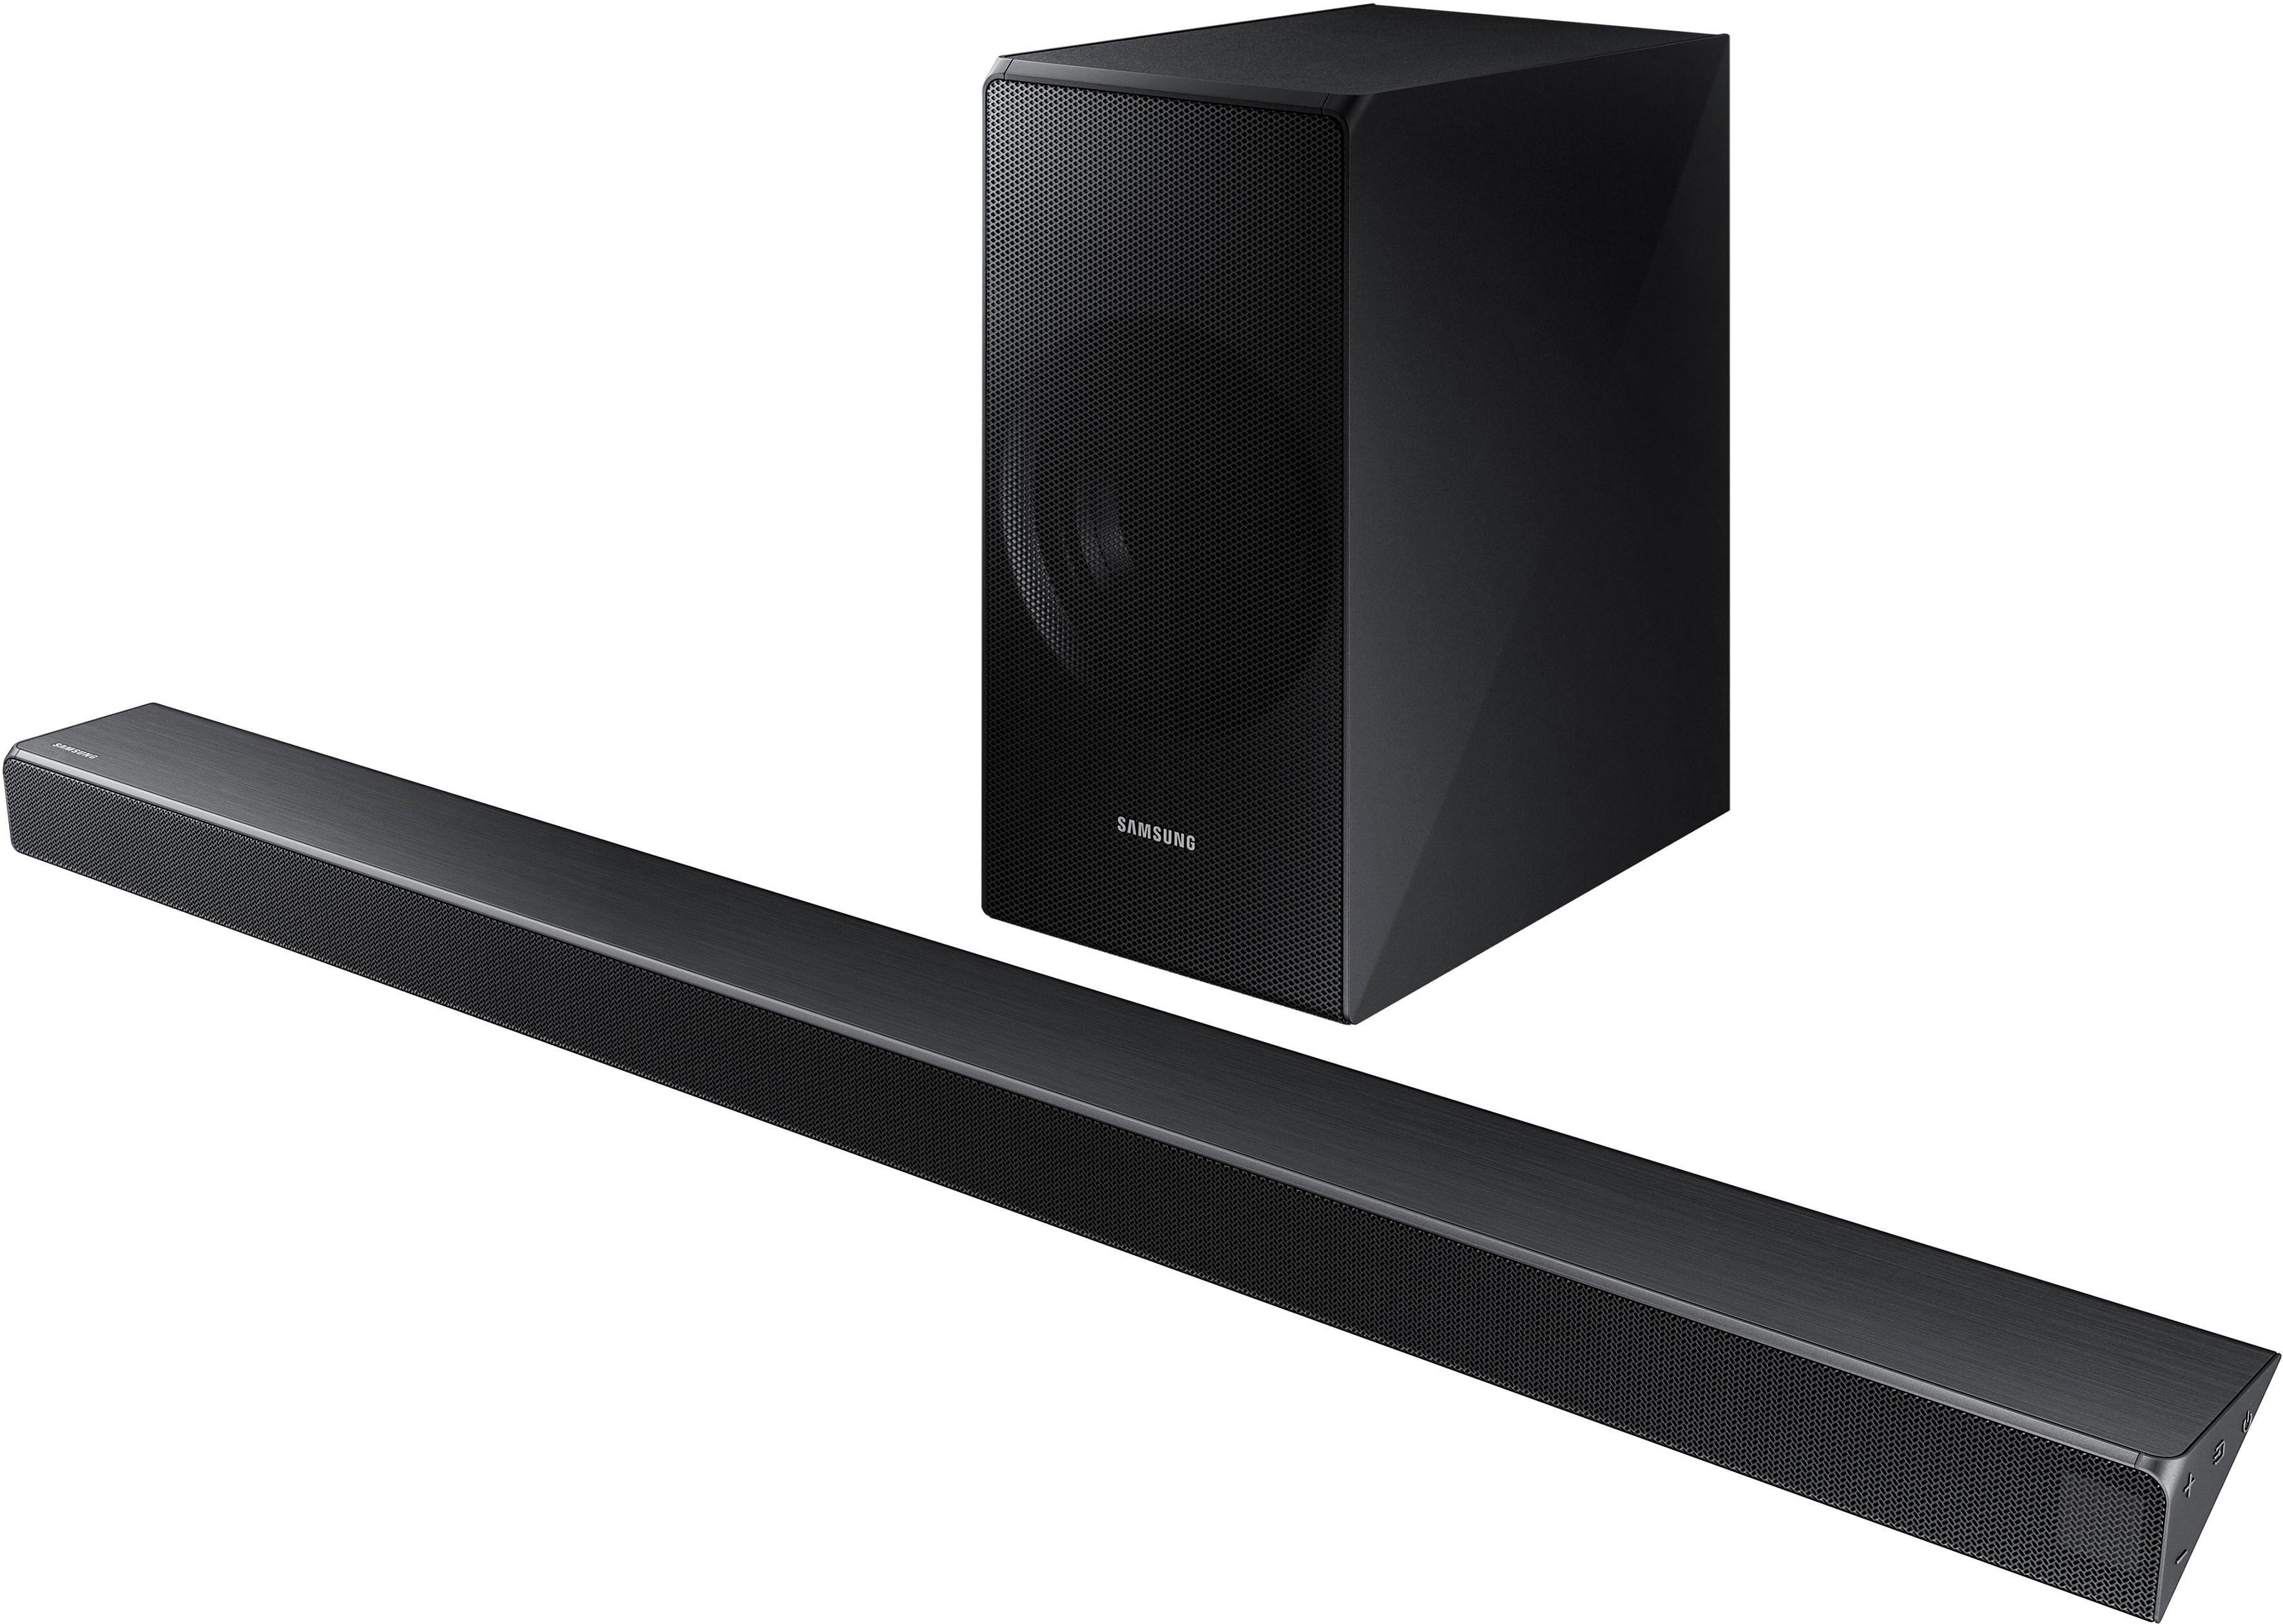 SAMSUNG »HW-N550/ZG« 3.1 Soundbar (bluetooth, 340 W) nu online kopen bij OTTO